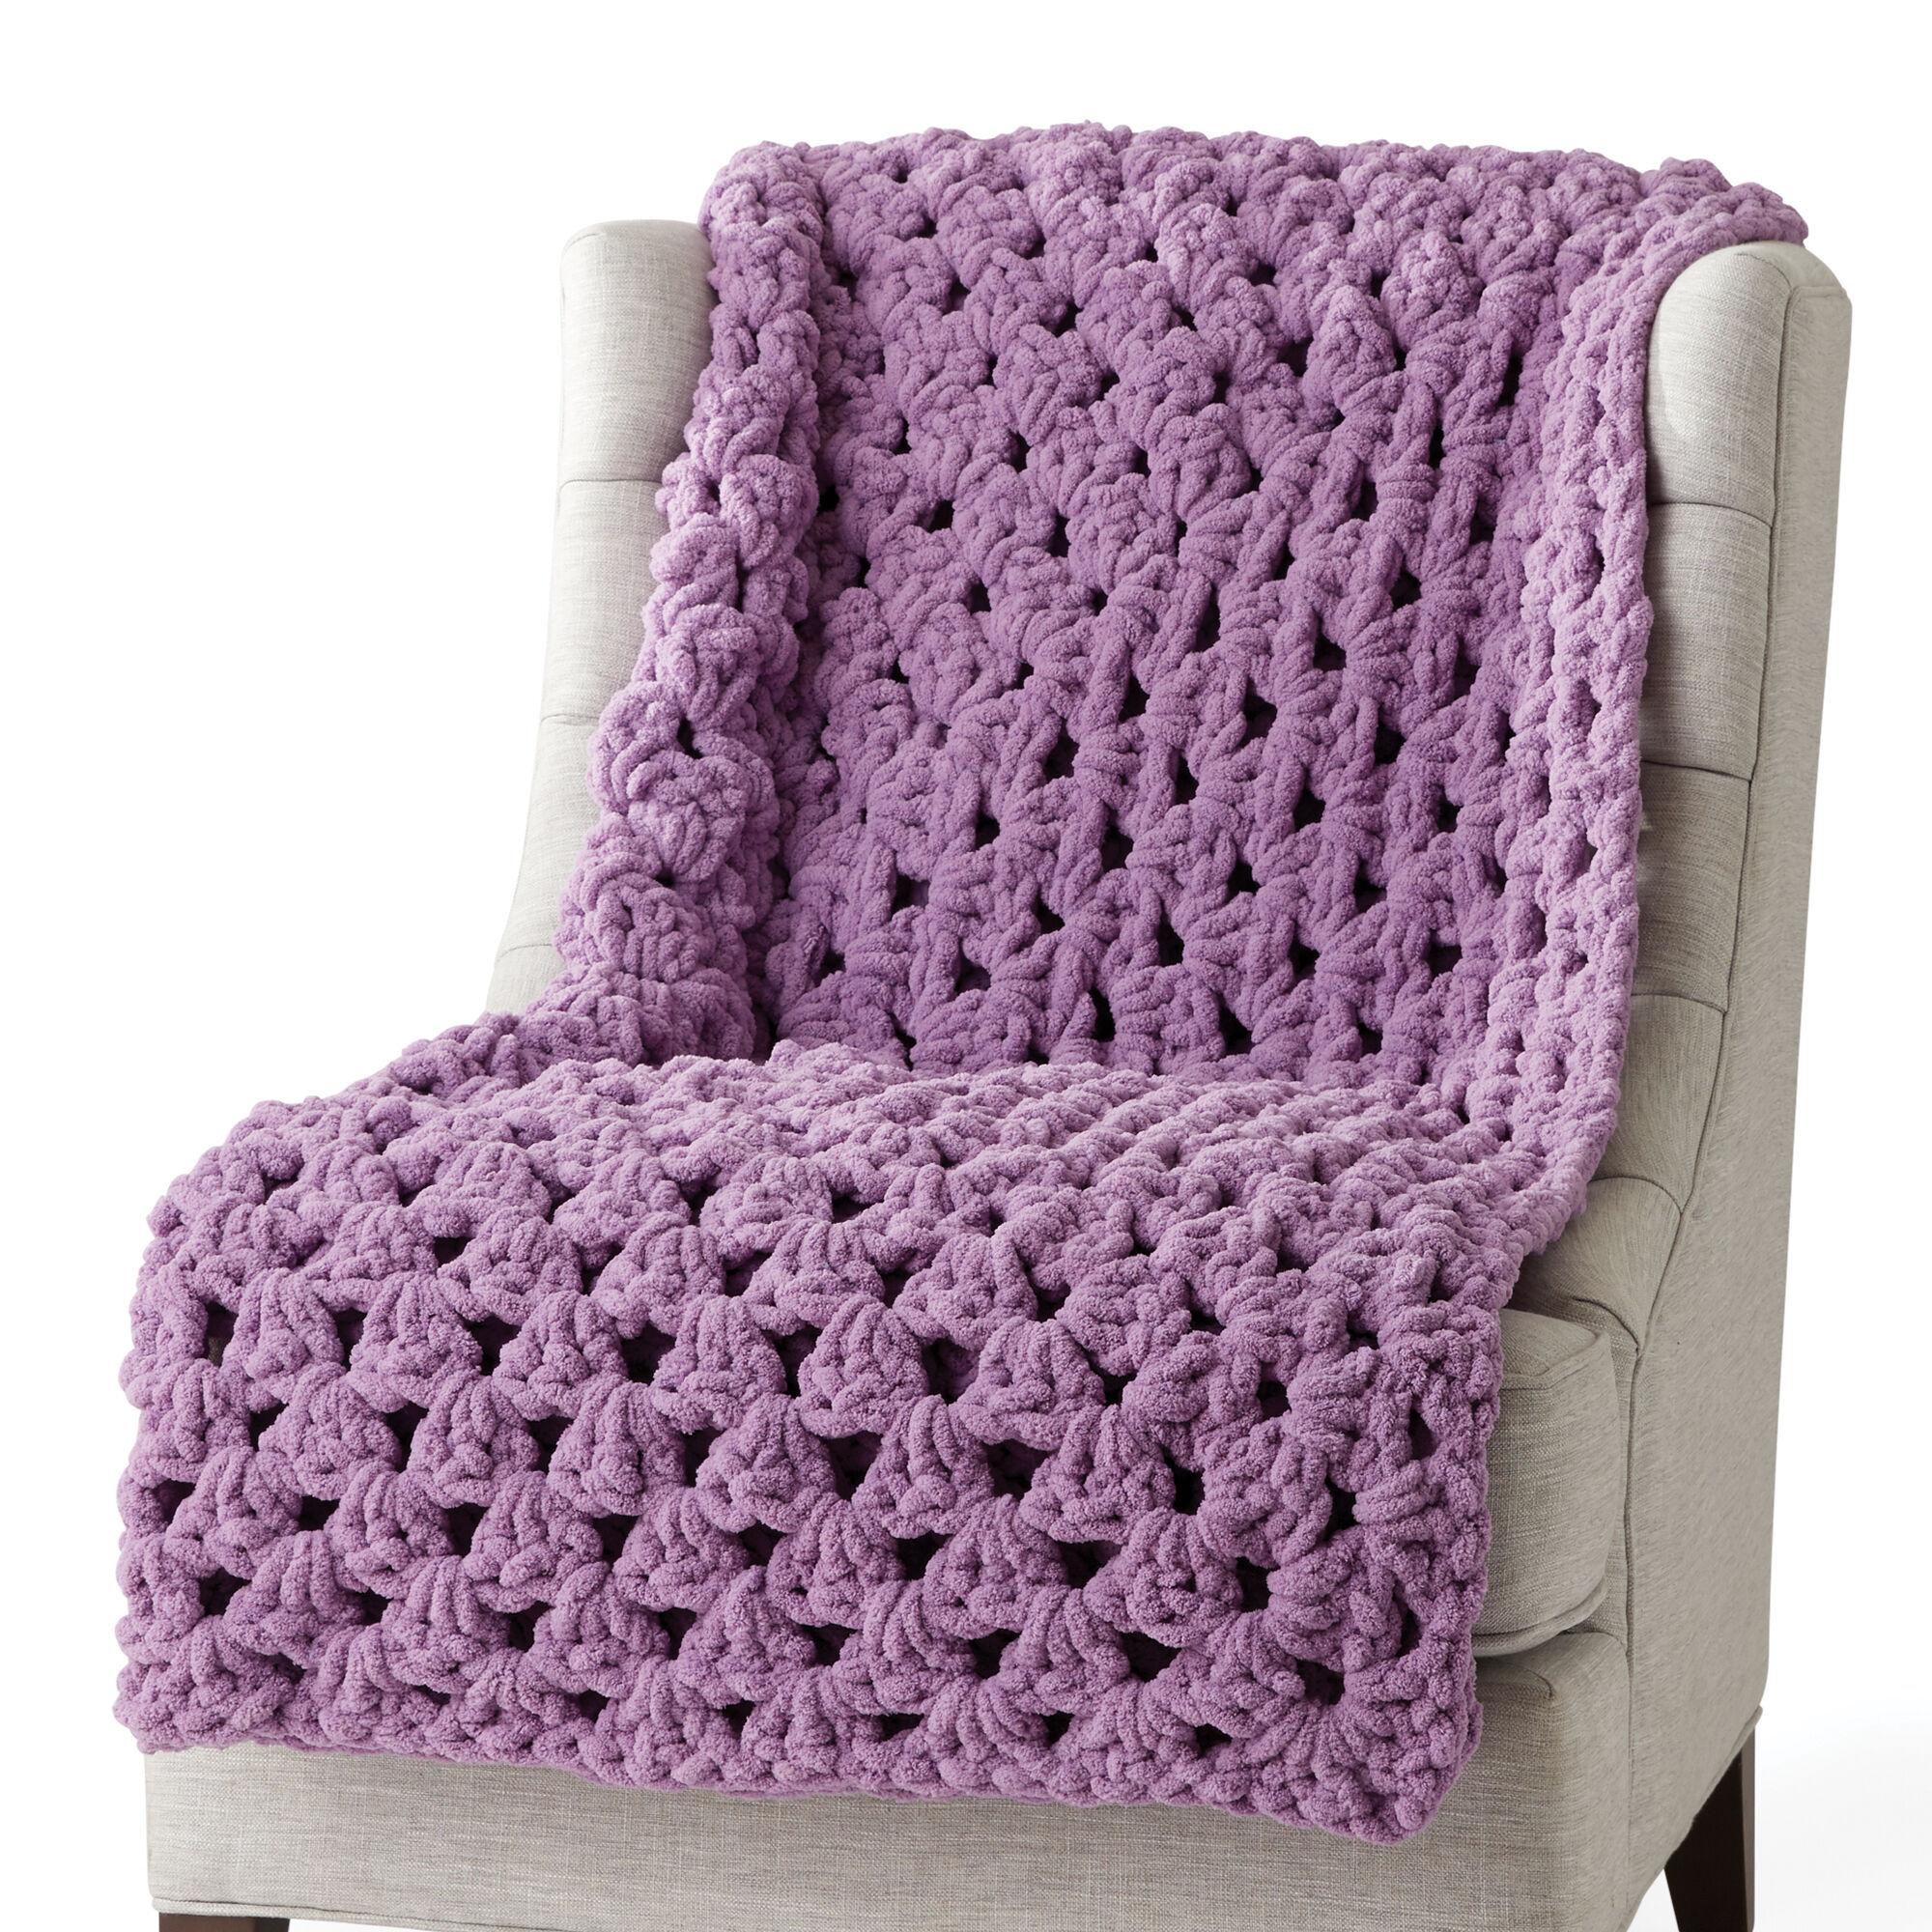 Bernat Granny Rectangle Crochet Afghan Pattern Yarnspirations